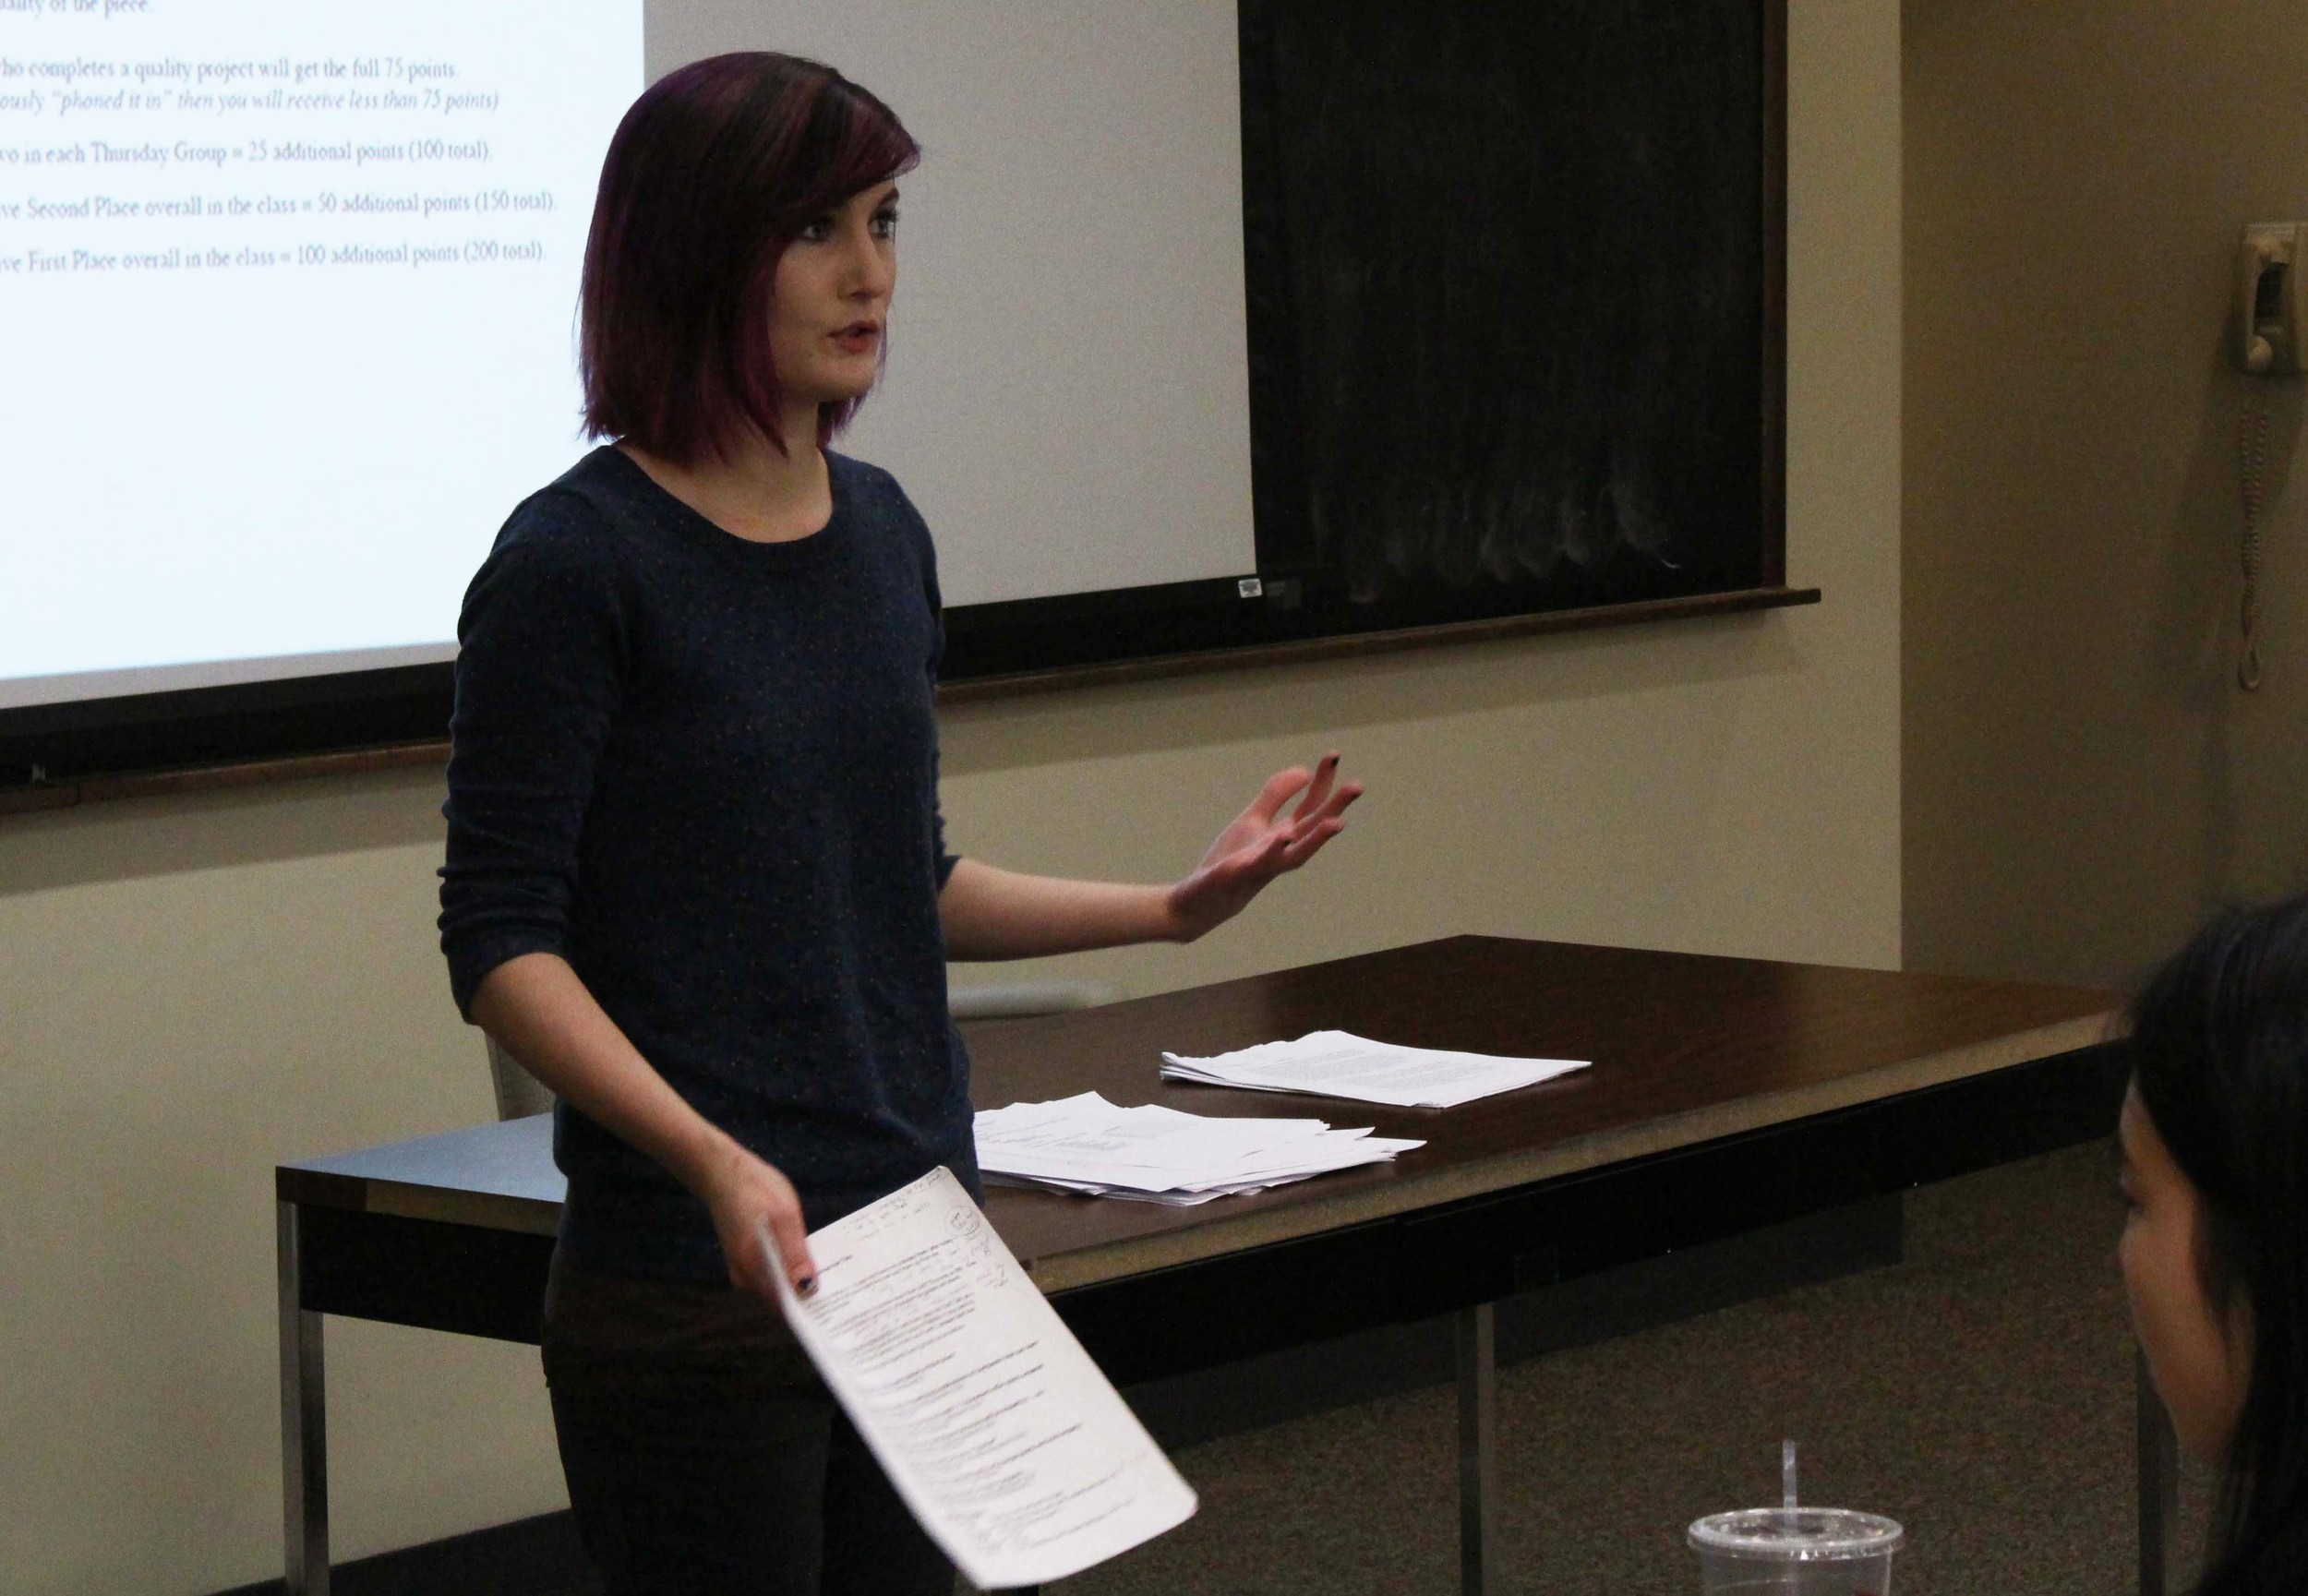 Mass Communication-Media Arts & Sciences Ph.D. student Steffi Shook leads an undergraduate class, Media and the Creative Process